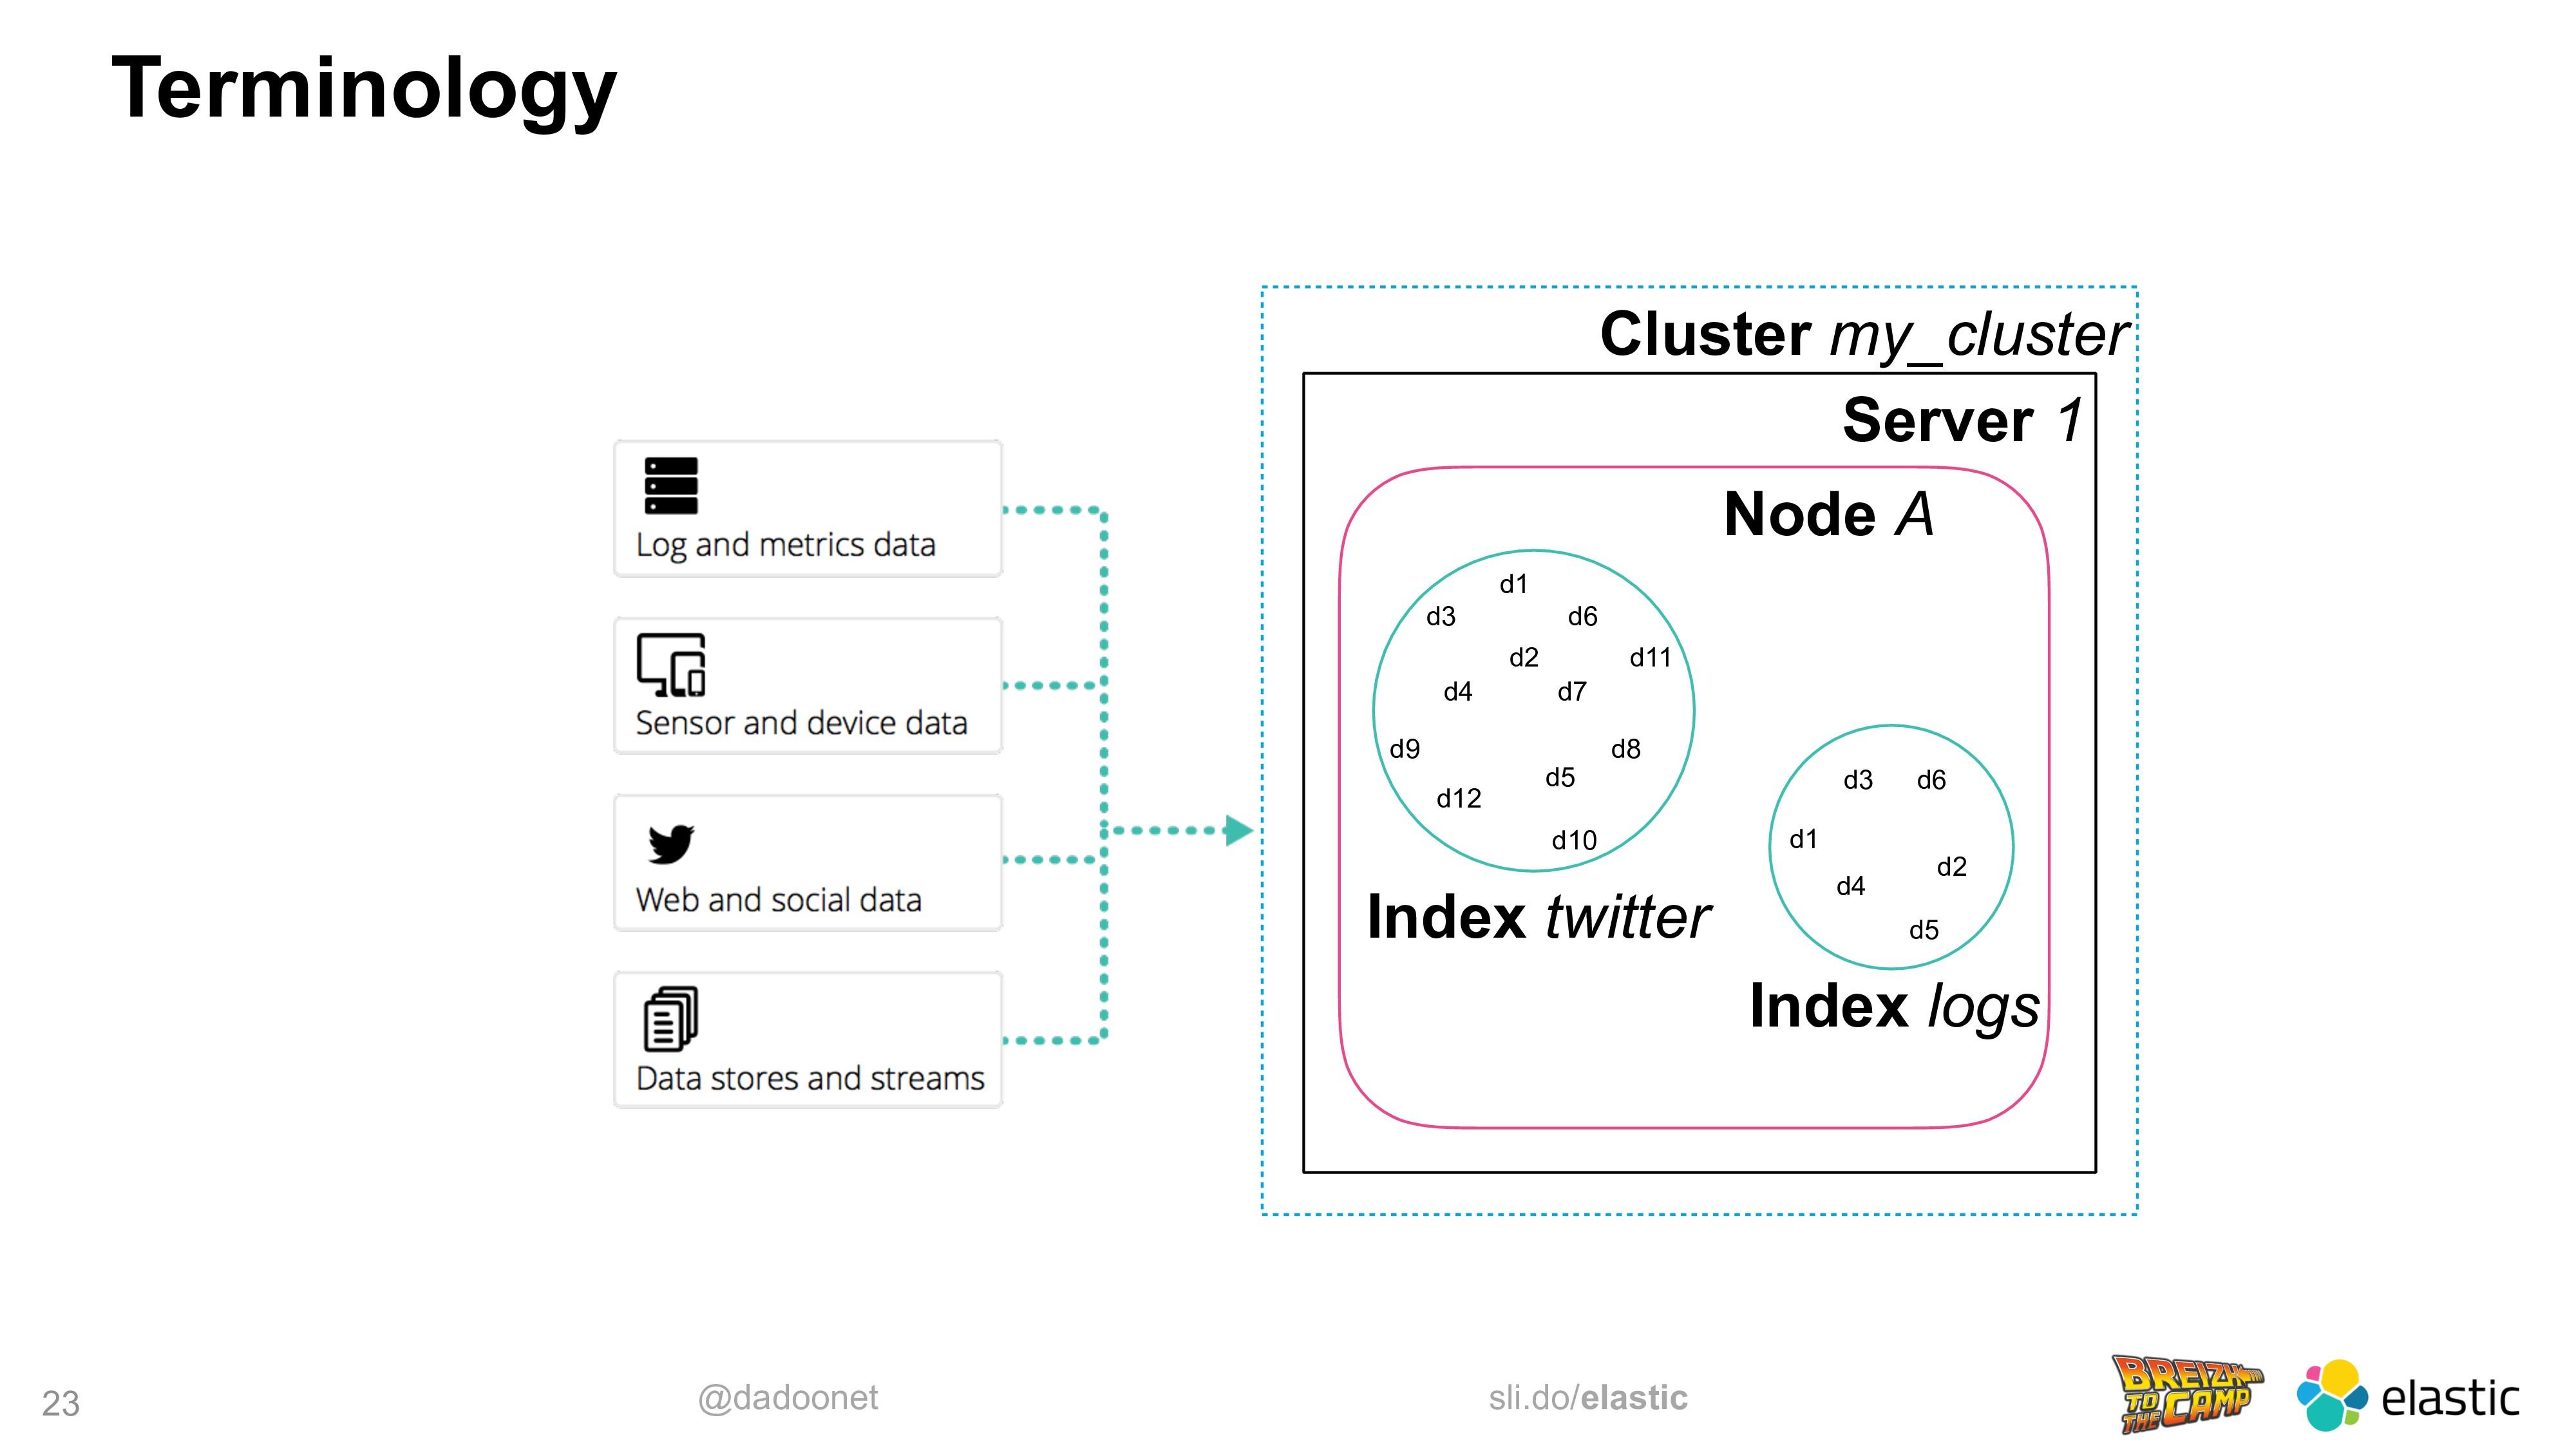 @dadoonet sli.do/elastic 23 Terminology Cluster...